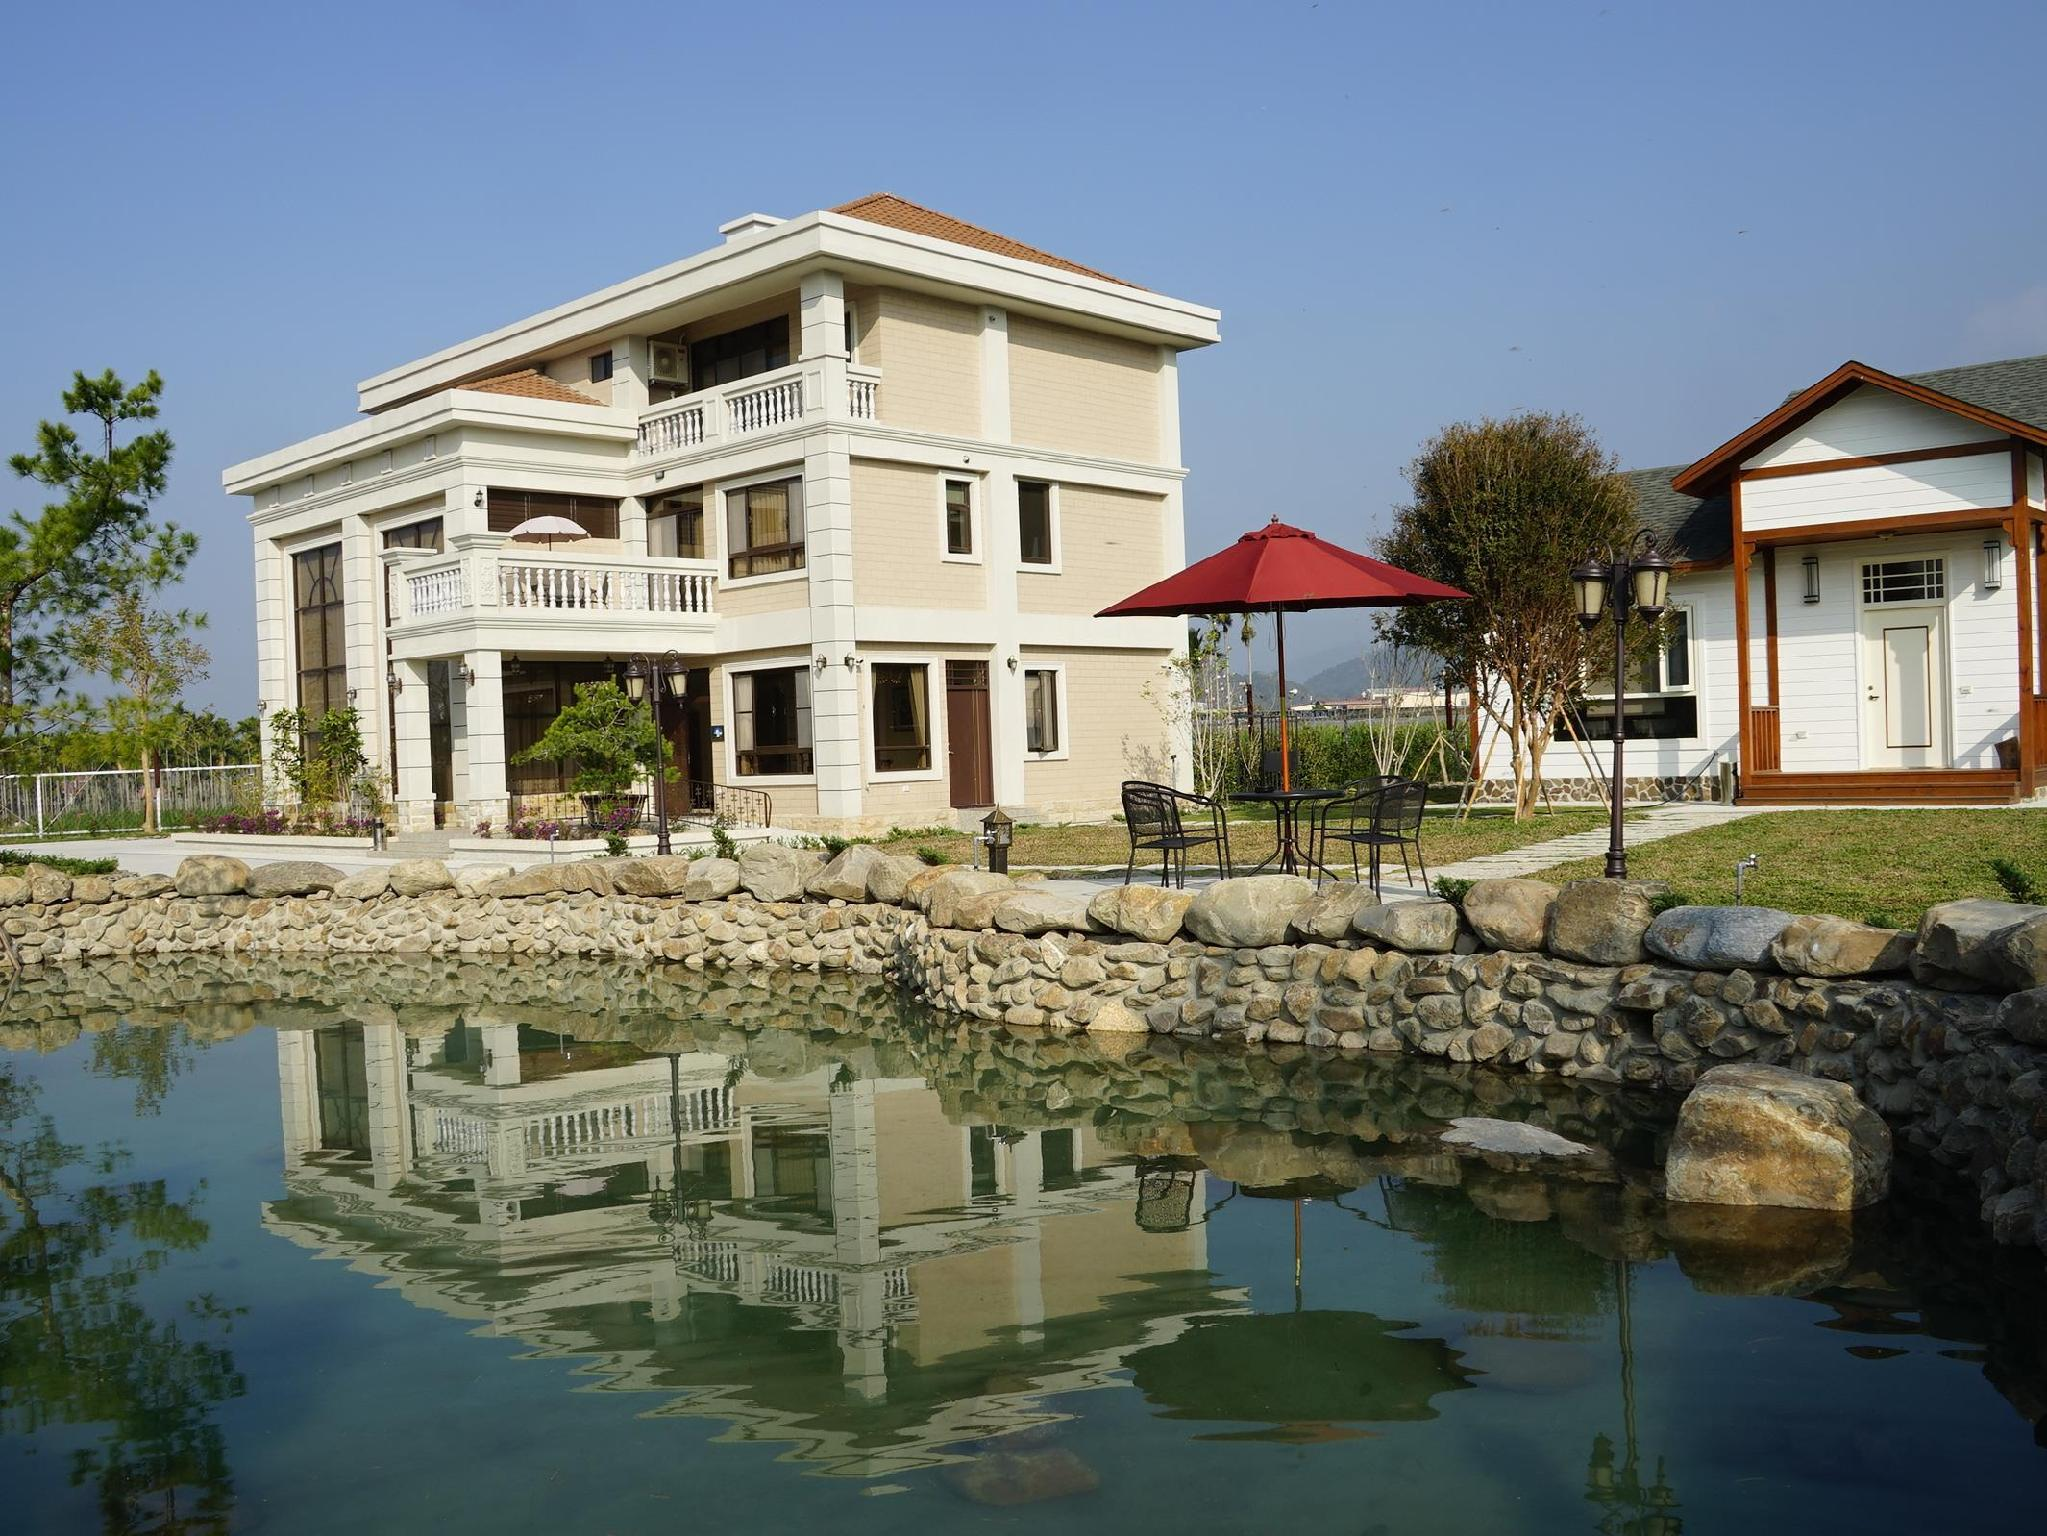 Windysong Home Stay - Nantou